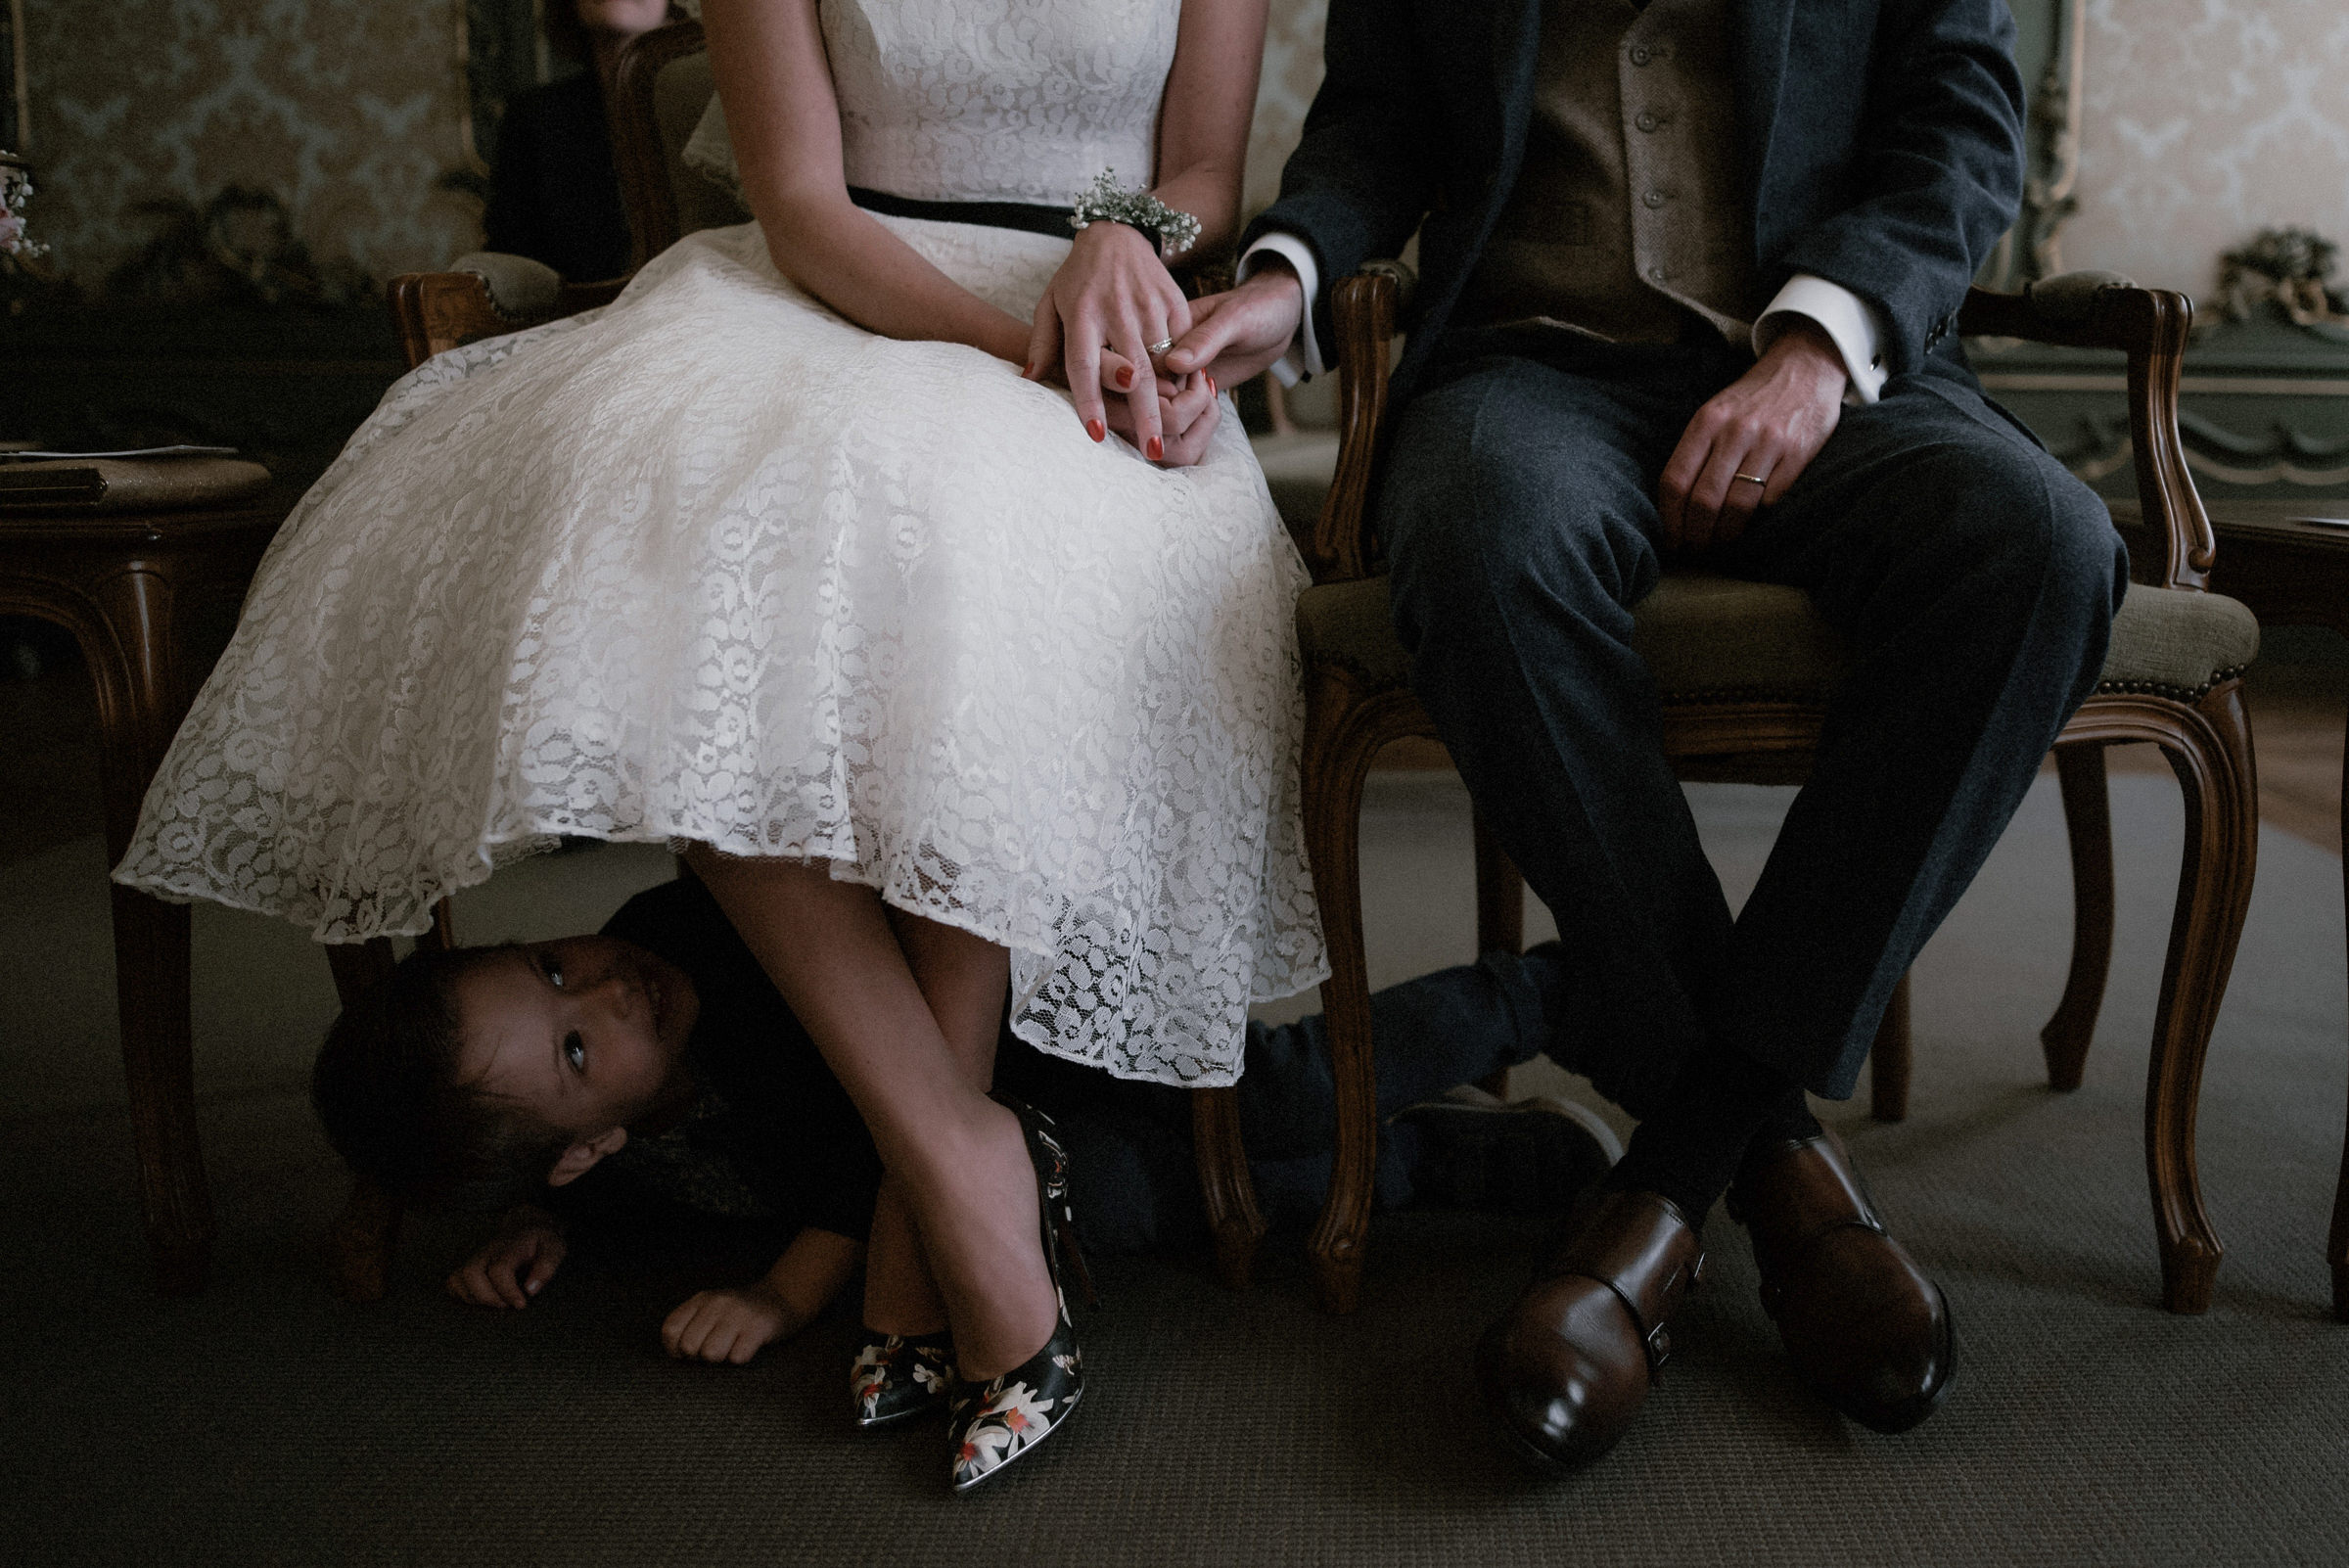 Little boy looks up dress of seated bride - photo by Naomi van der Kraan